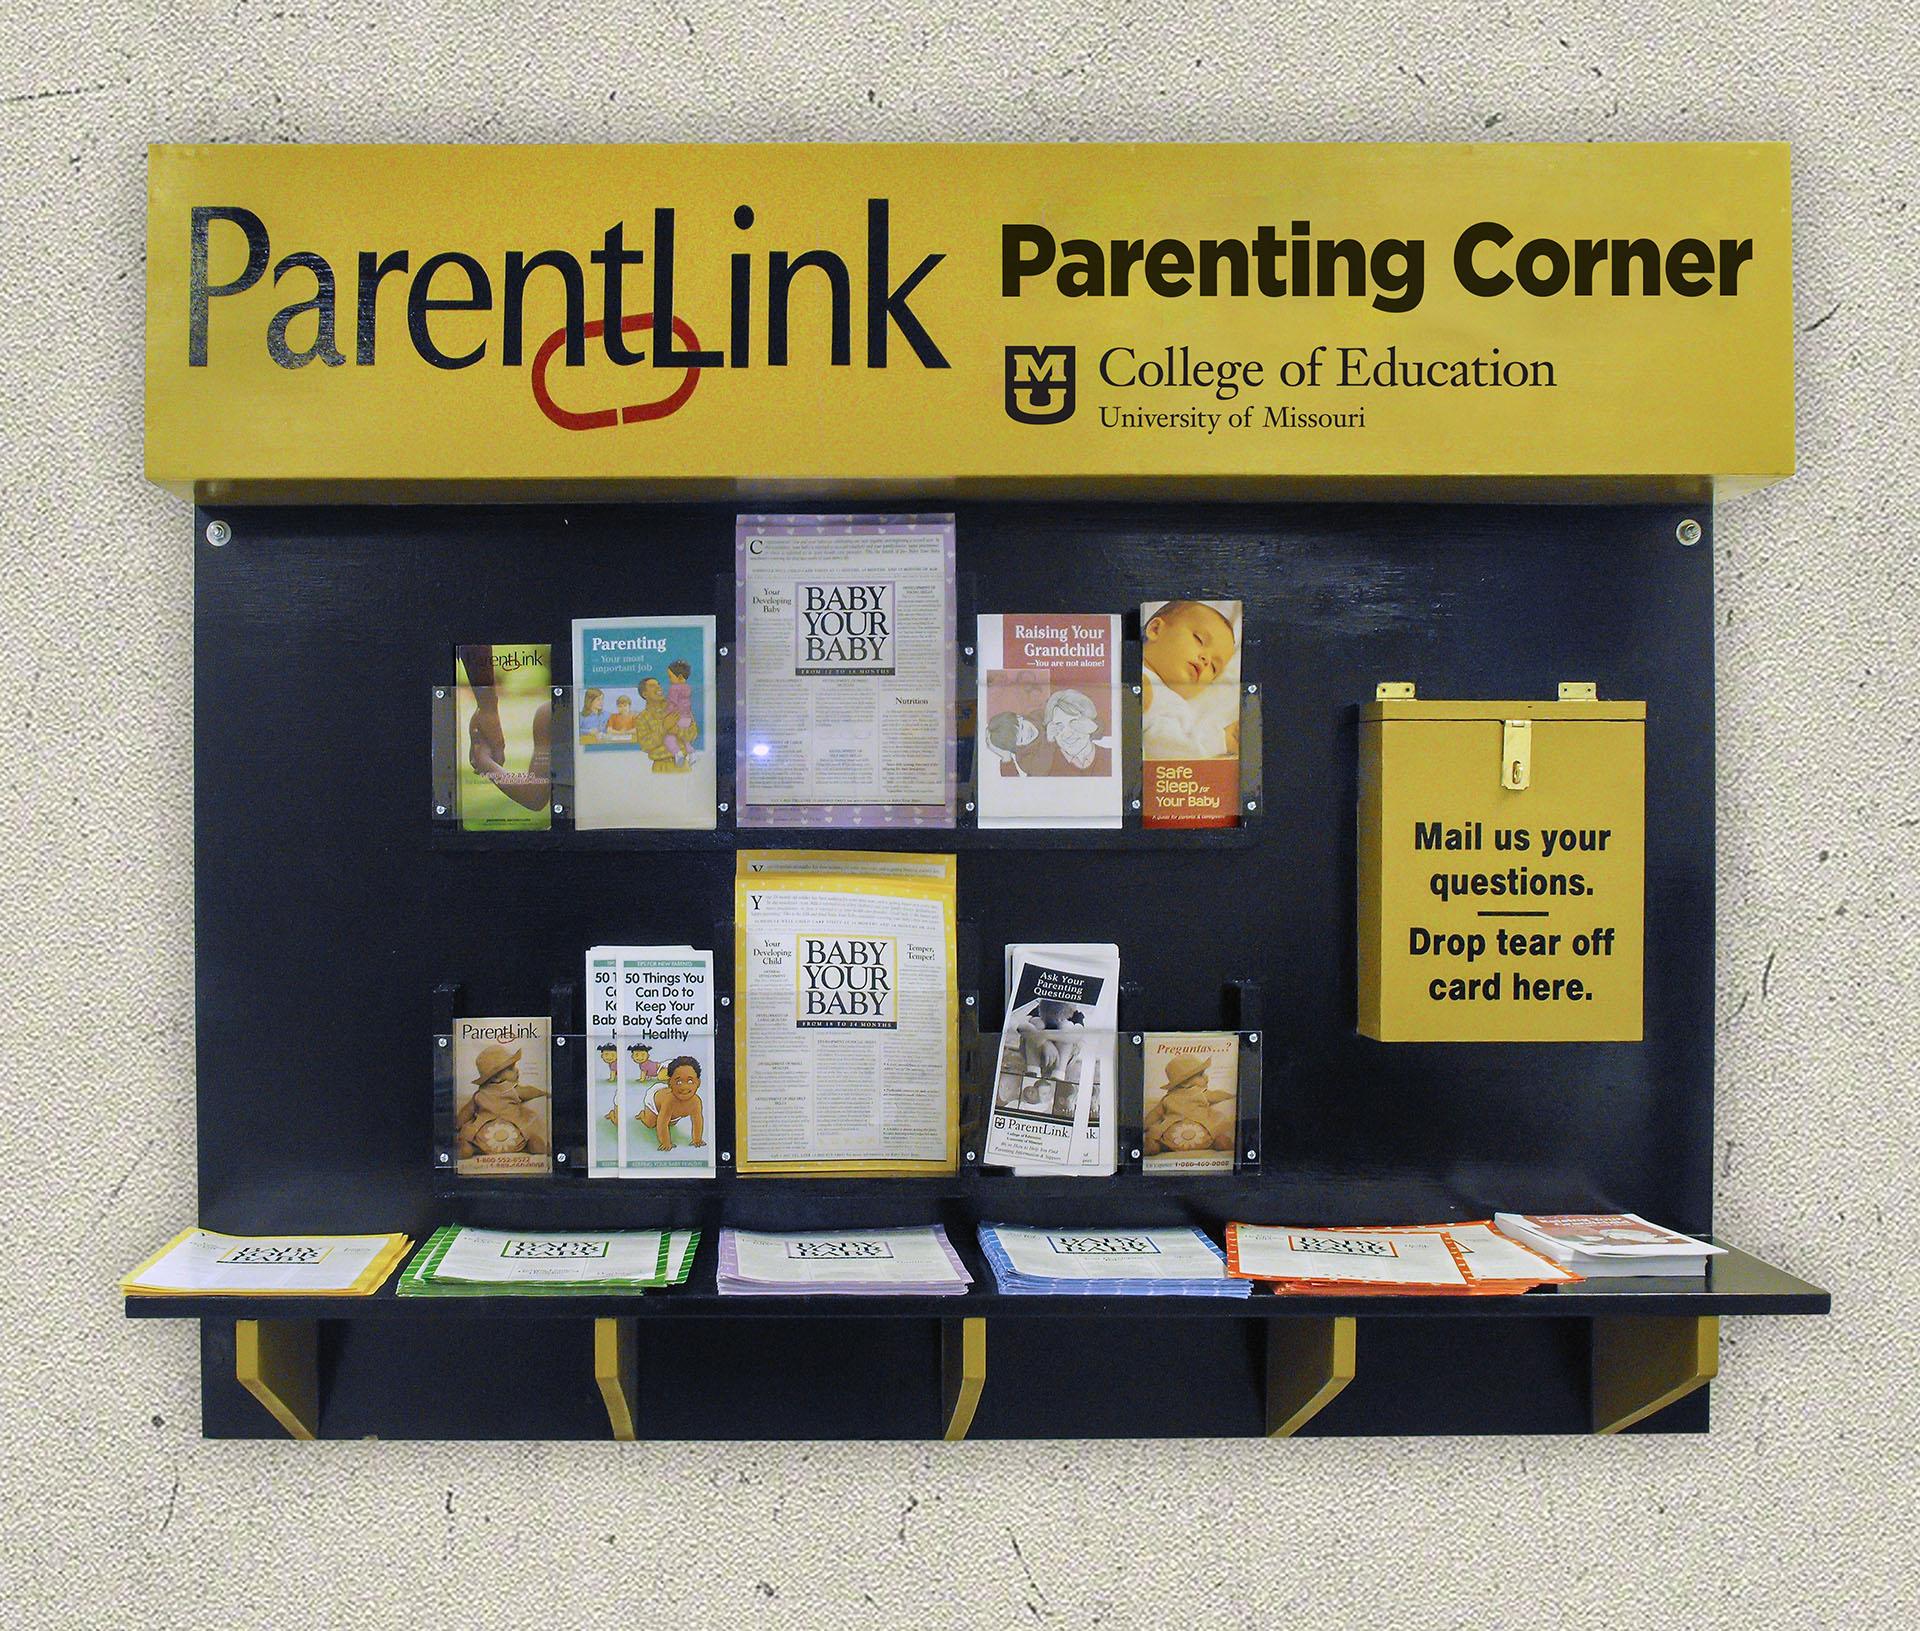 ParentLink Parenting Corners, Services for Incarcerated Parents